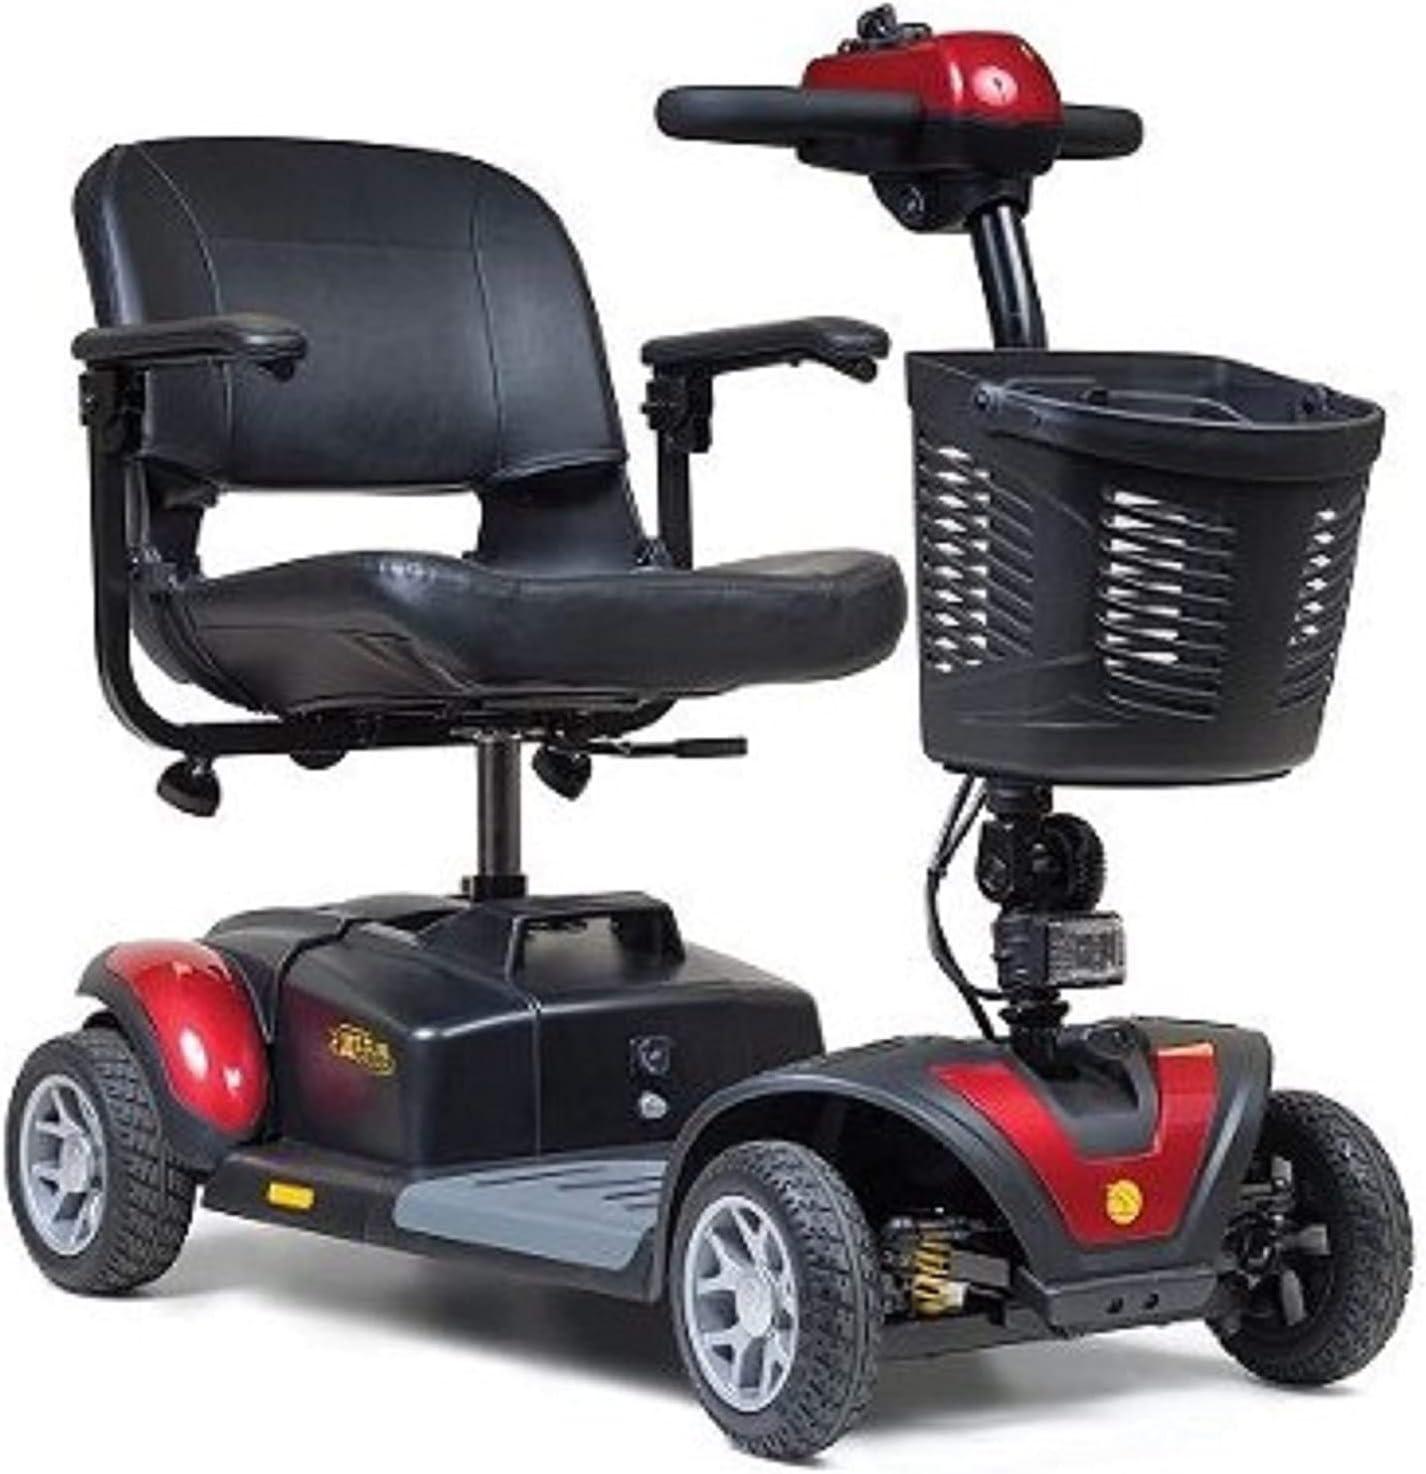 Golden Choice Technologies - Buzzaround XLS Max 61% OFF Travel Scooter HD 4-whe